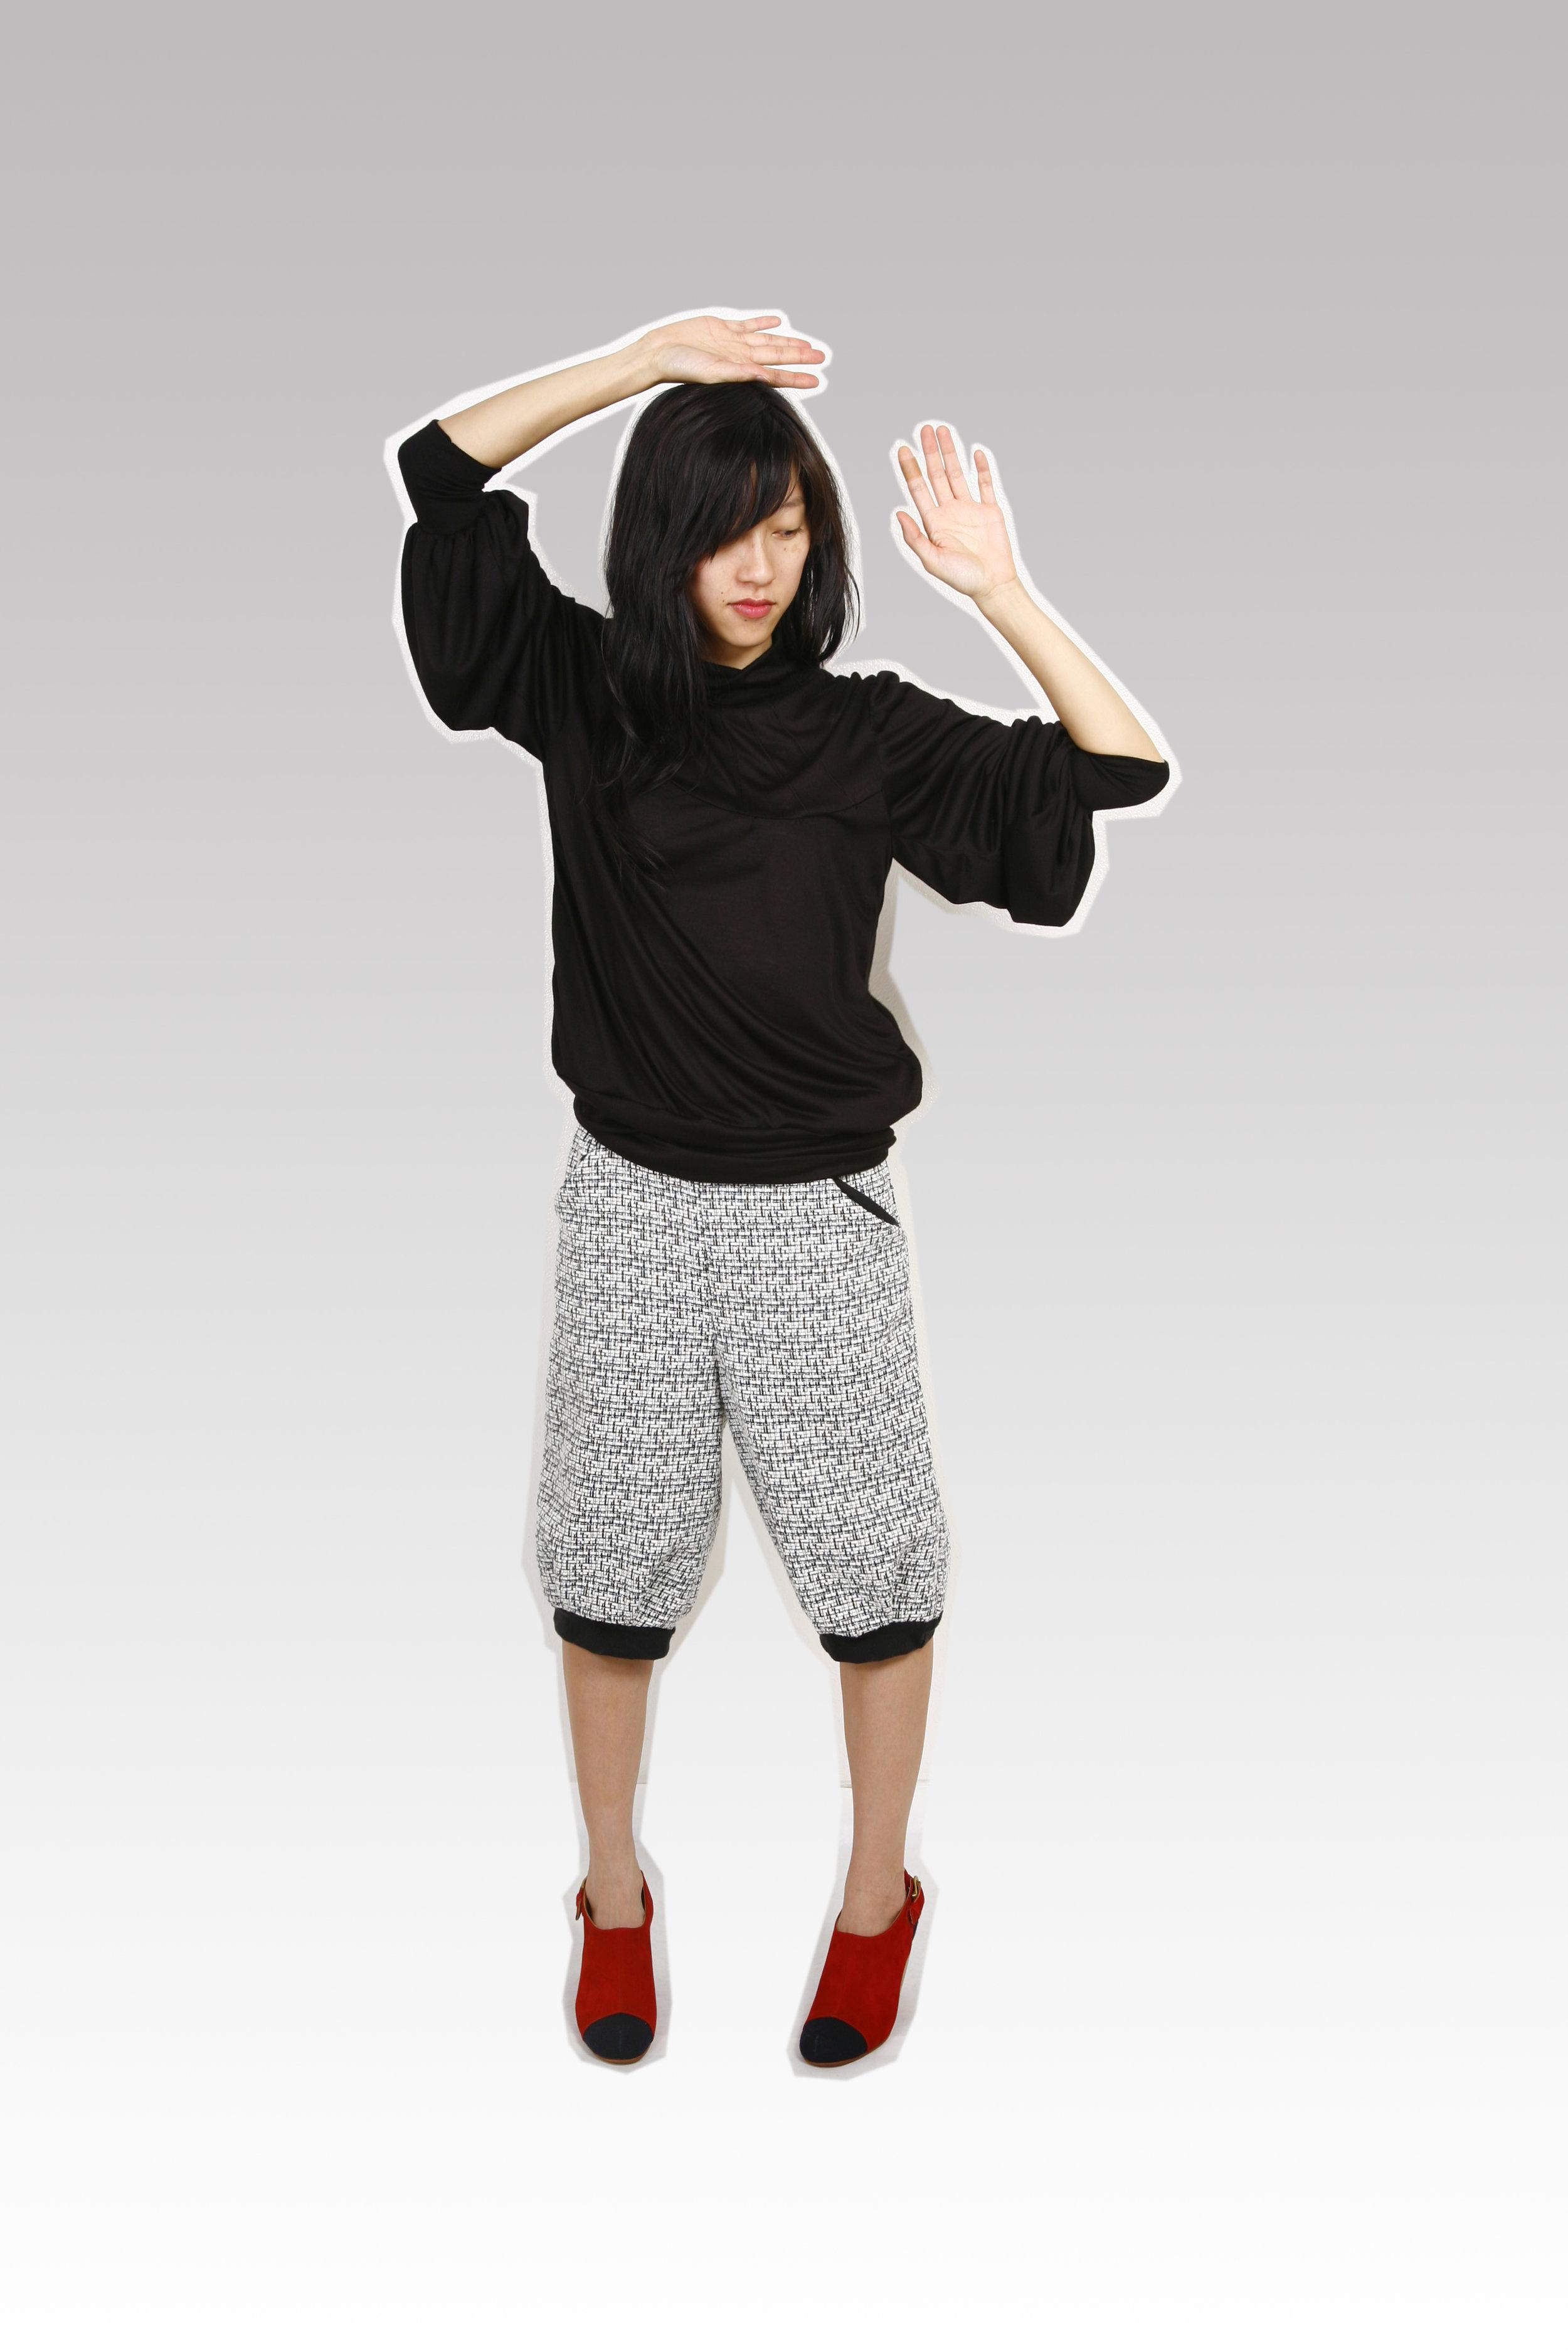 Photographer //  Christine Taylor                                                       Role  // Designed and sewed original HT sportswear